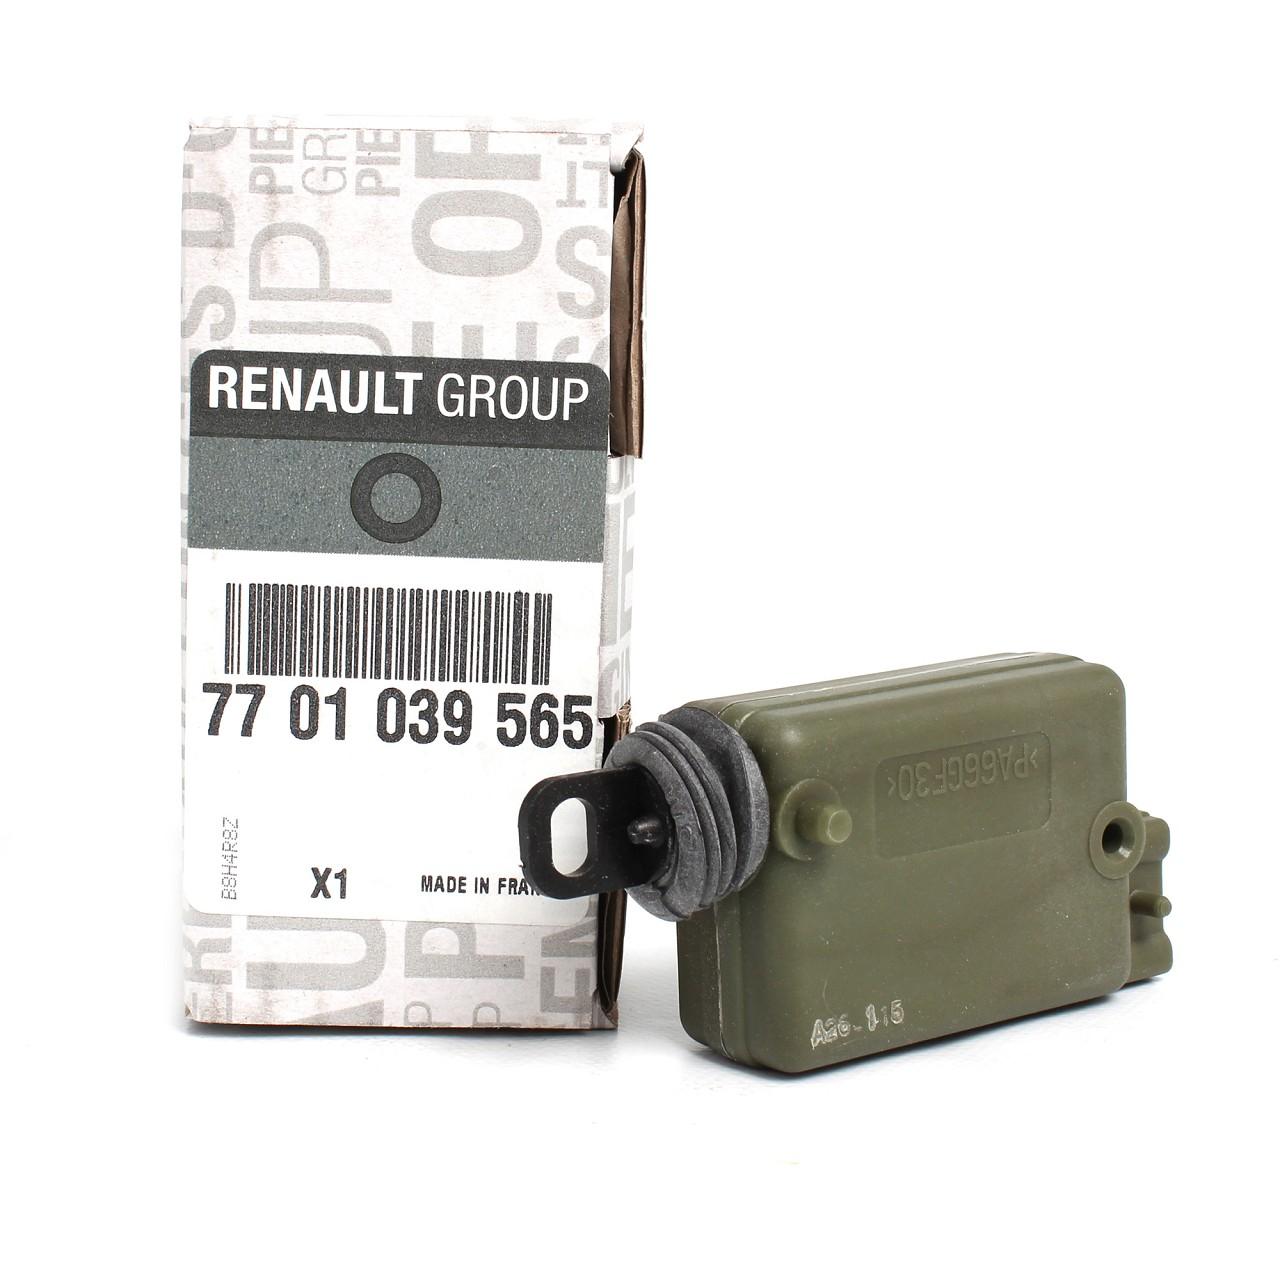 ORIGINAL Renault Stellmotor Türschloss CLIO ESPACE MEGANE SCENIC 7701039565